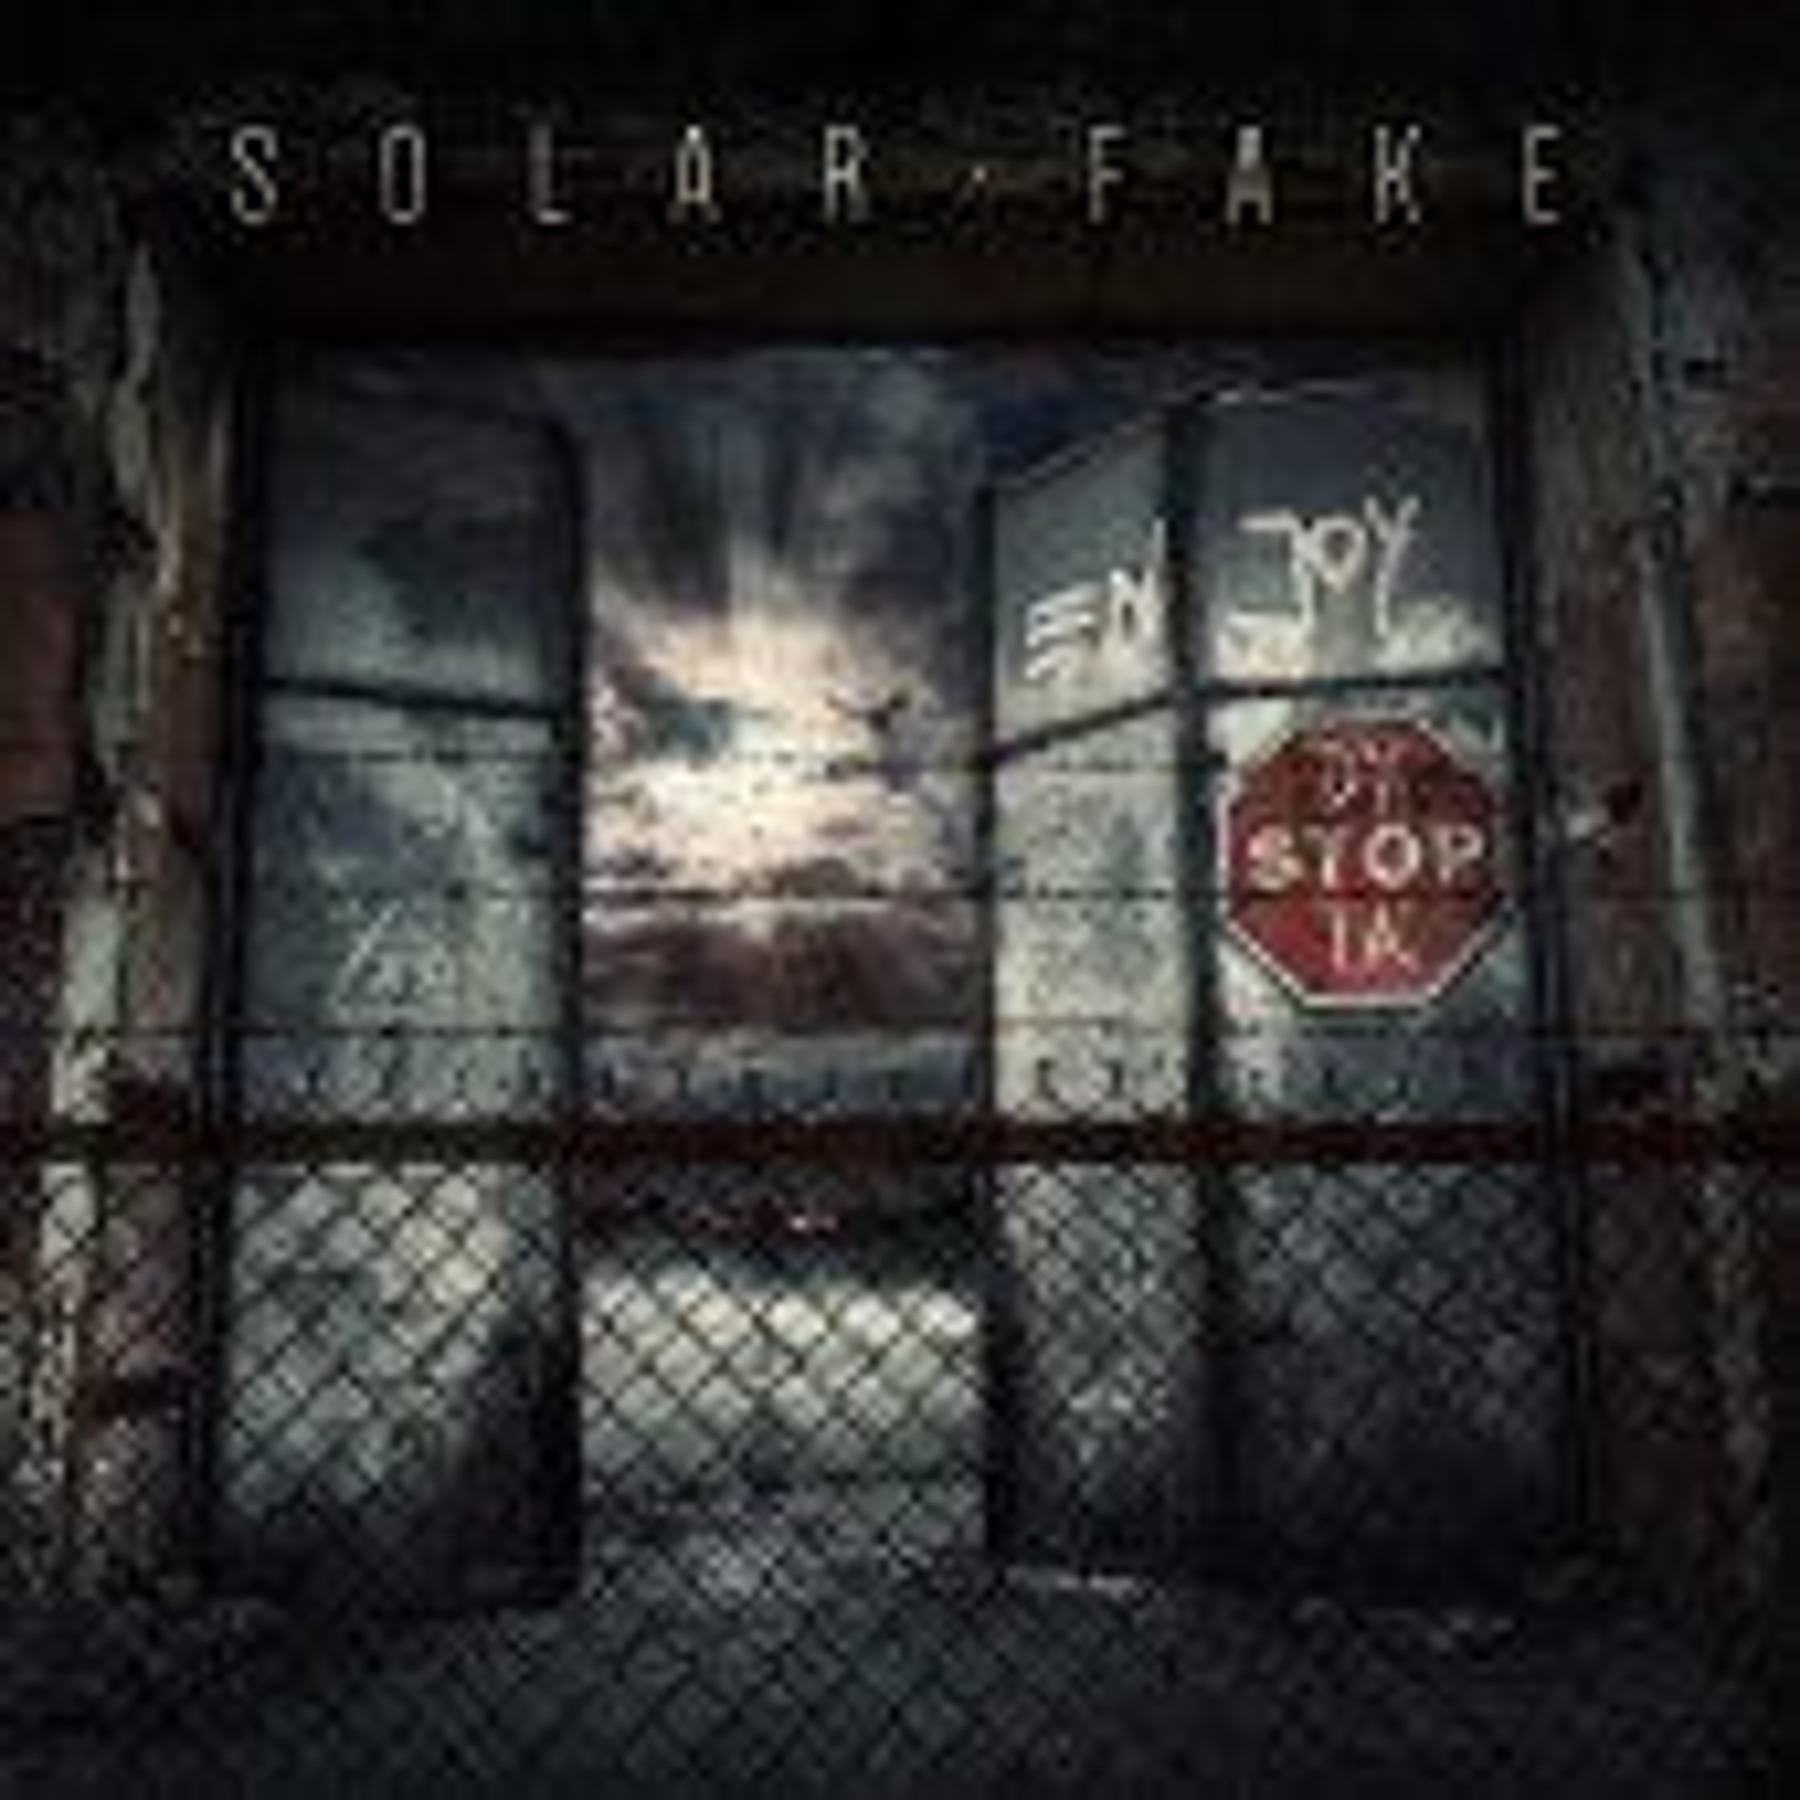 Solar Fake - Enjoy Dystopia (Deluxe Edition) - 2CD